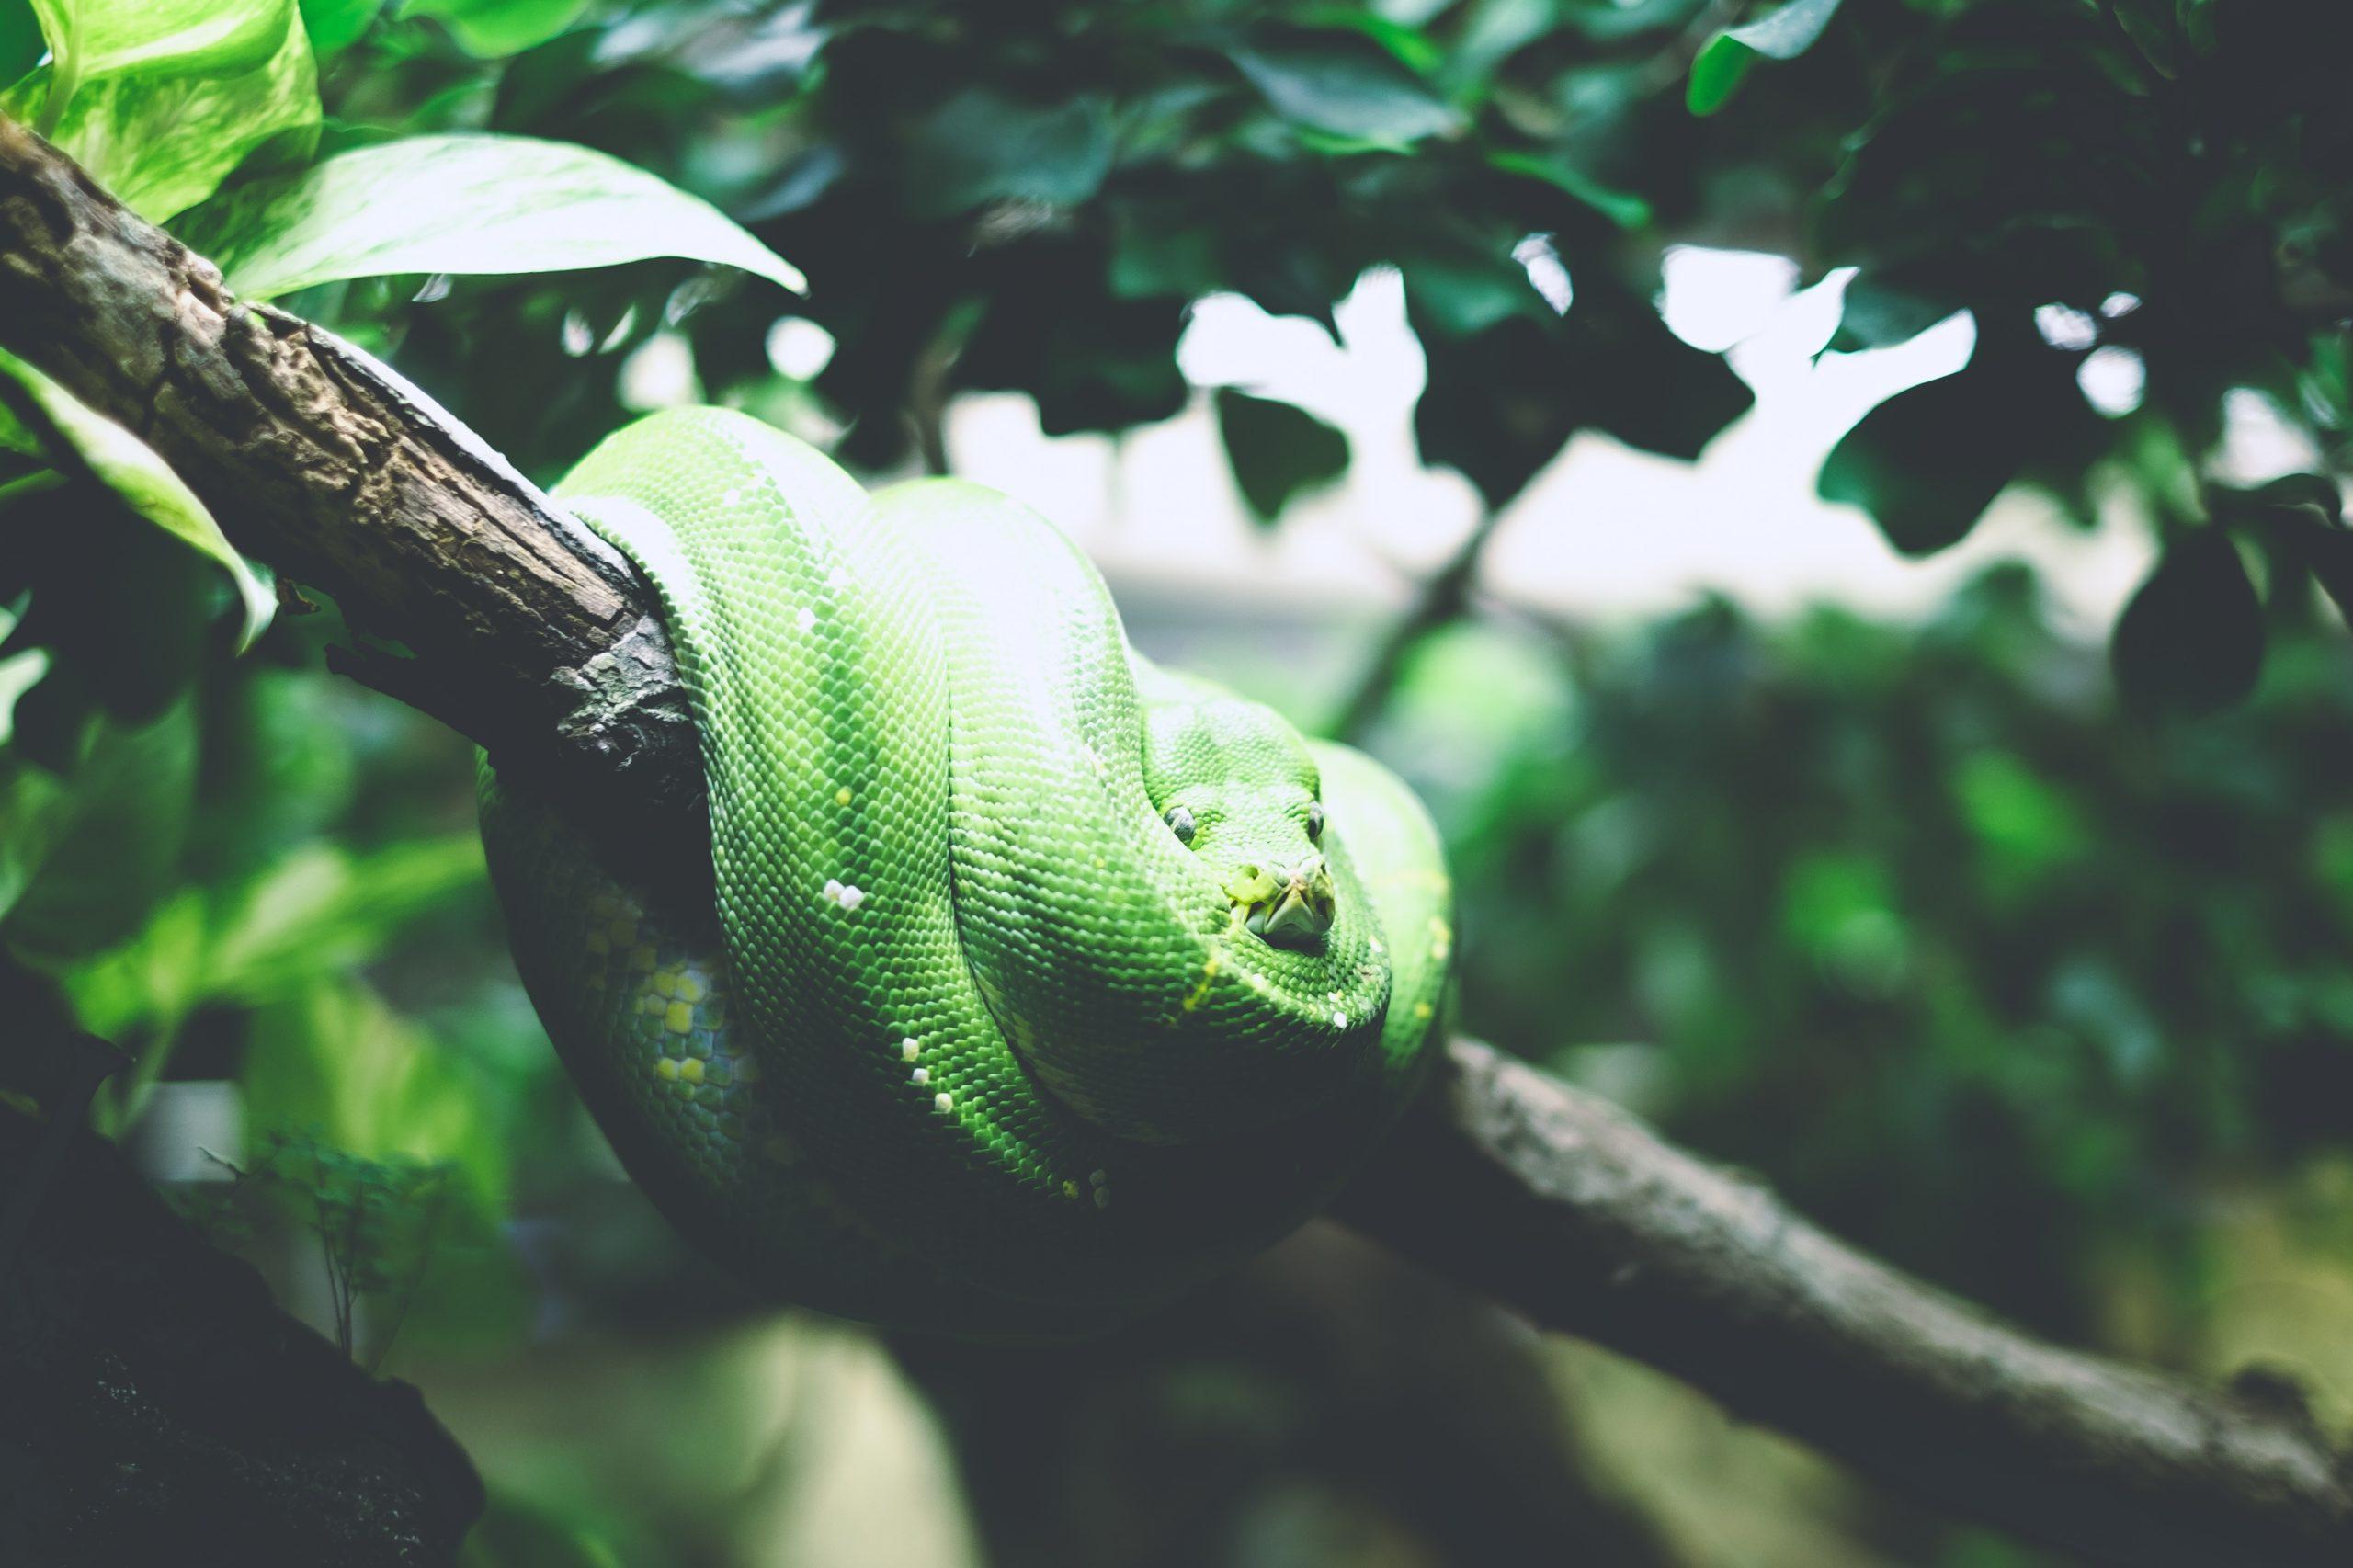 Slinkse slang